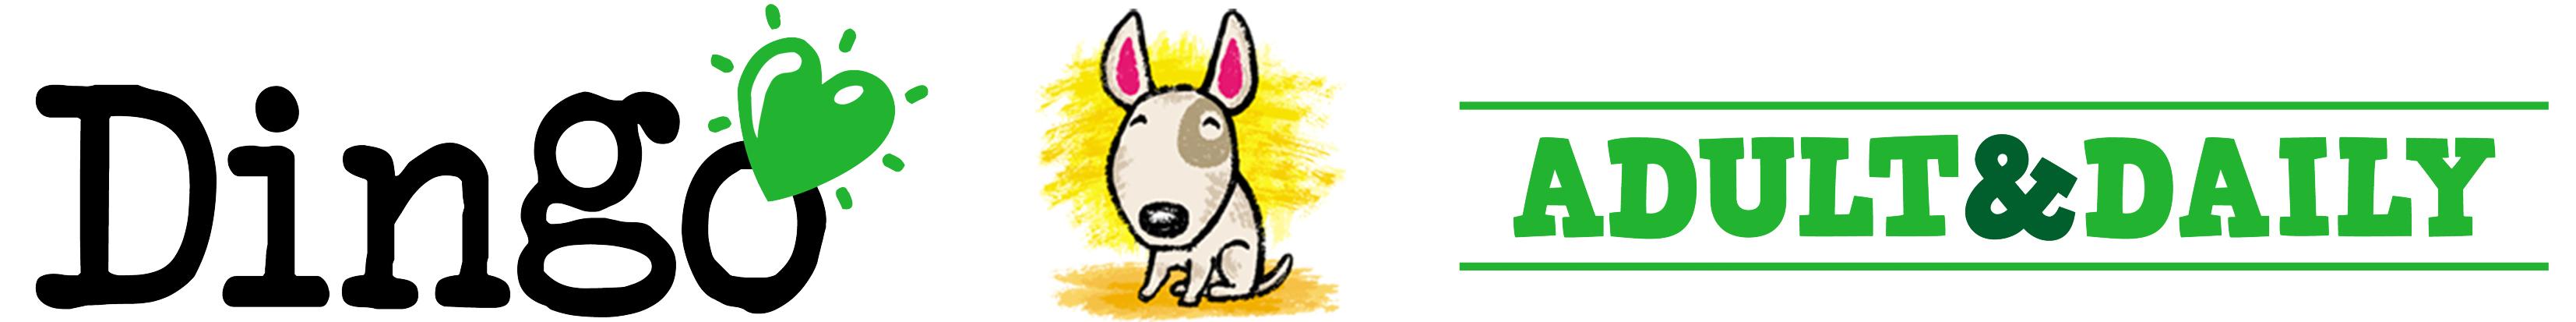 Pienso_Dingo_Puppy_&_Junior_Cabecera